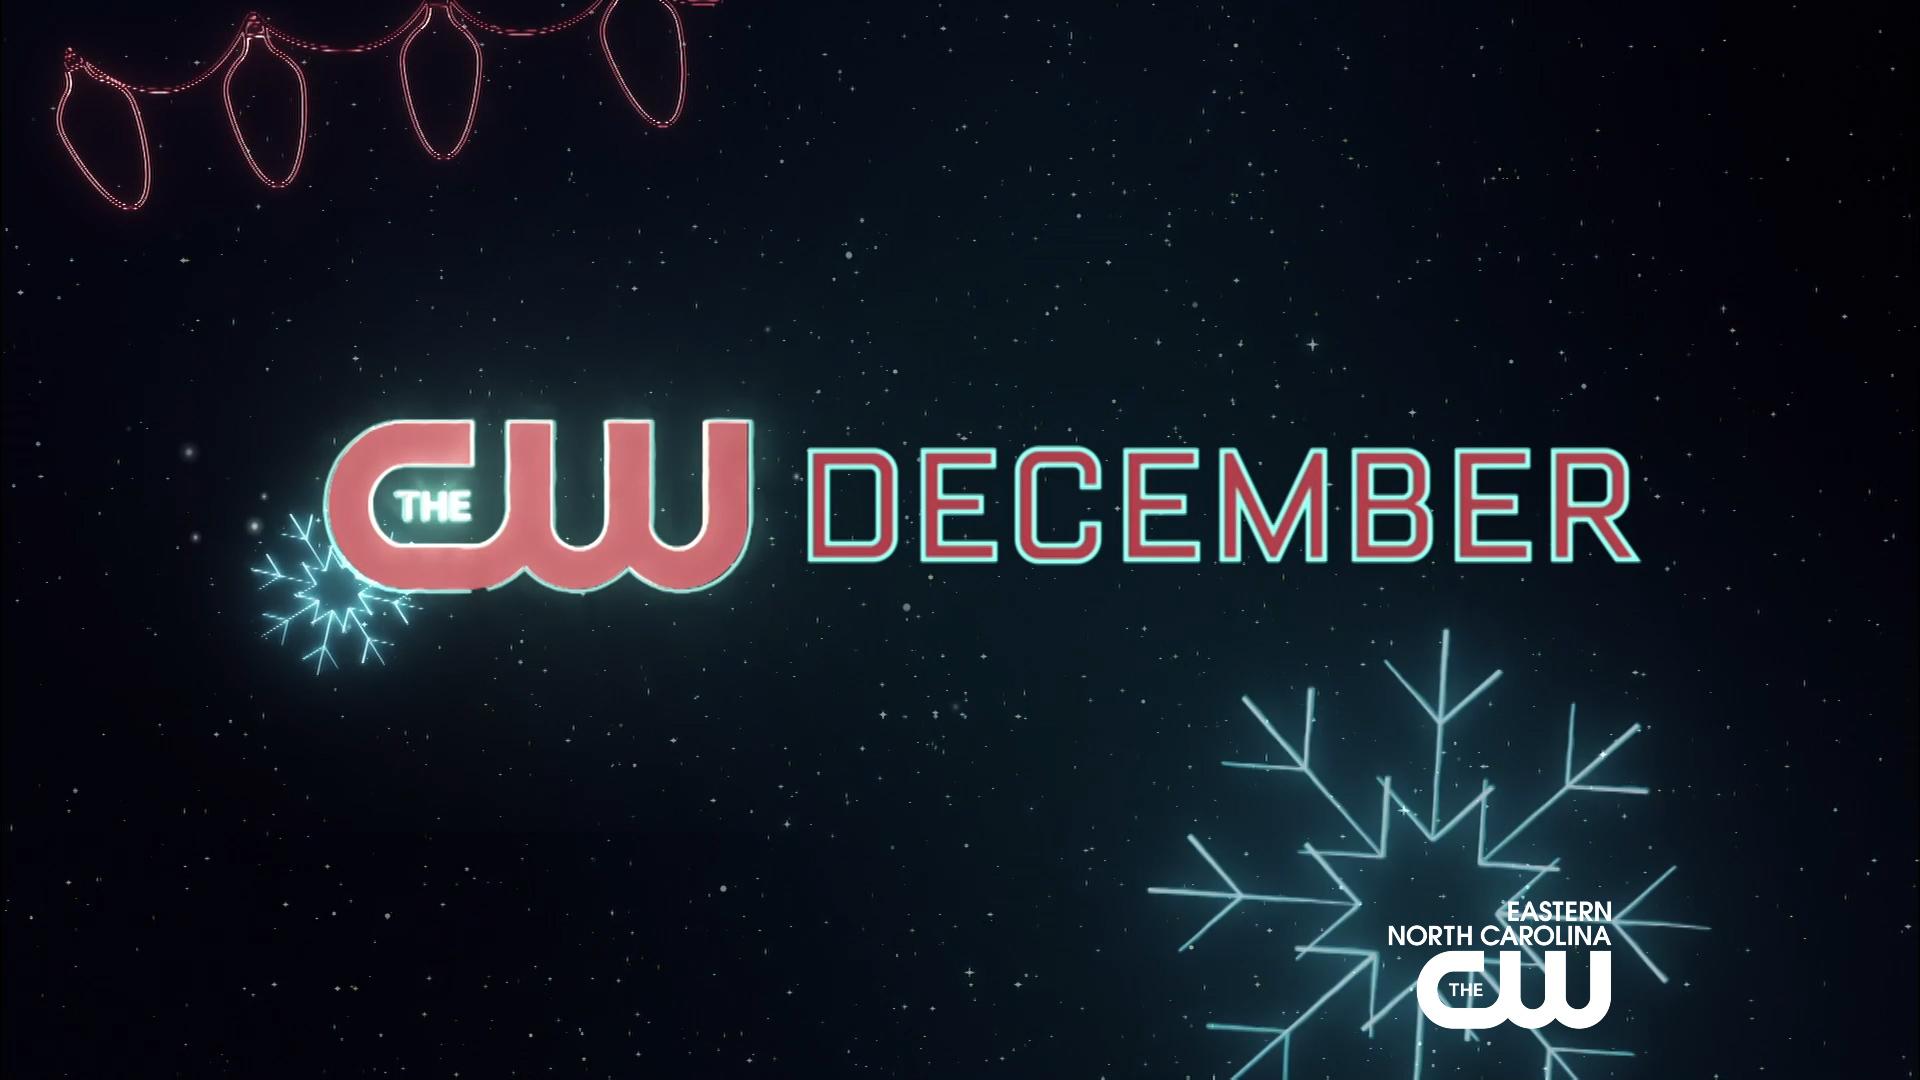 CW December Holiday Specials